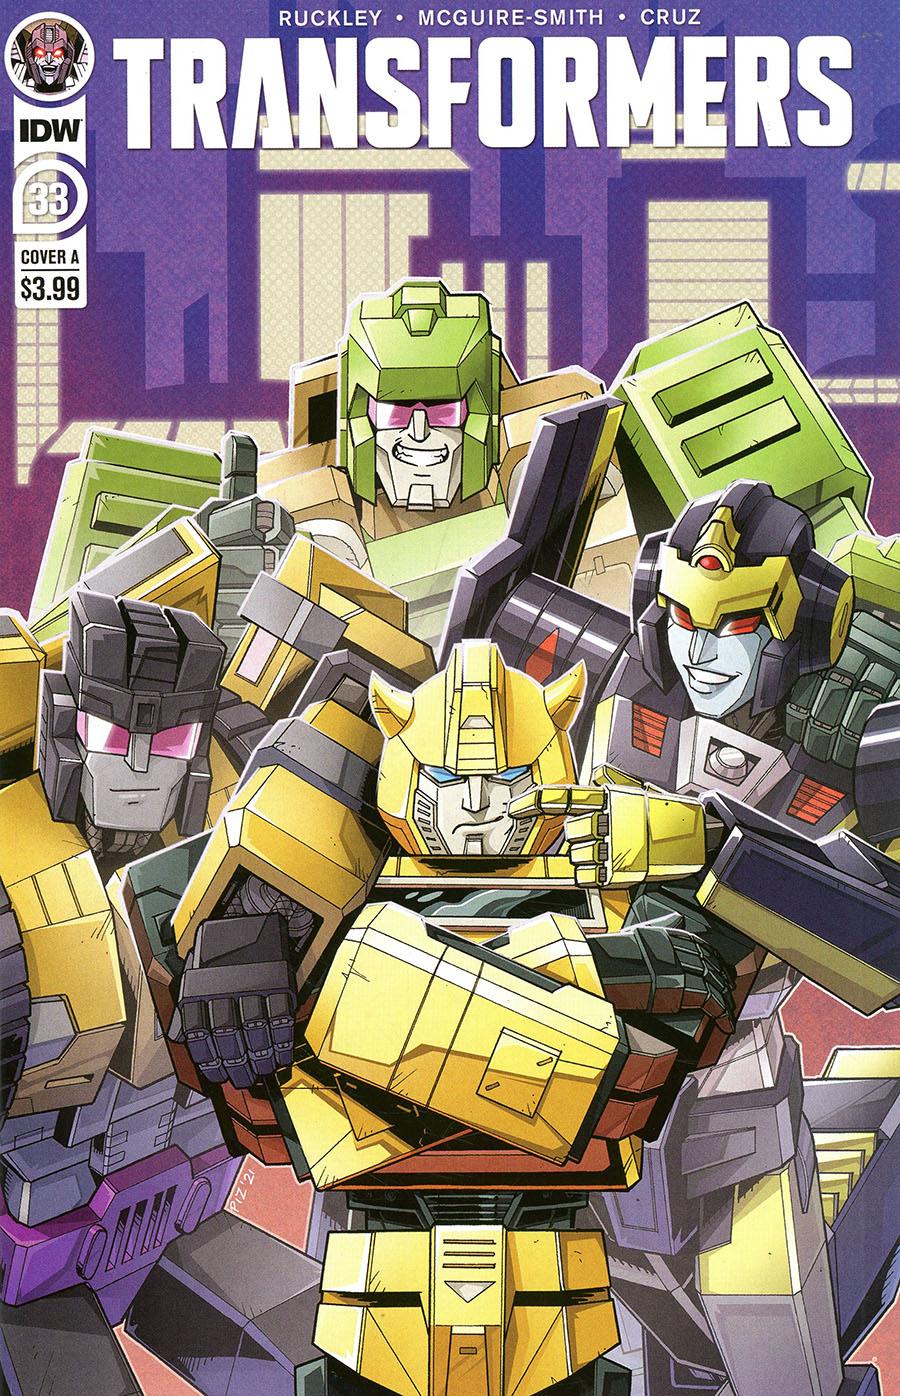 Transformers Vol 4 #33 Cover A Regular Ed Pierre Cover